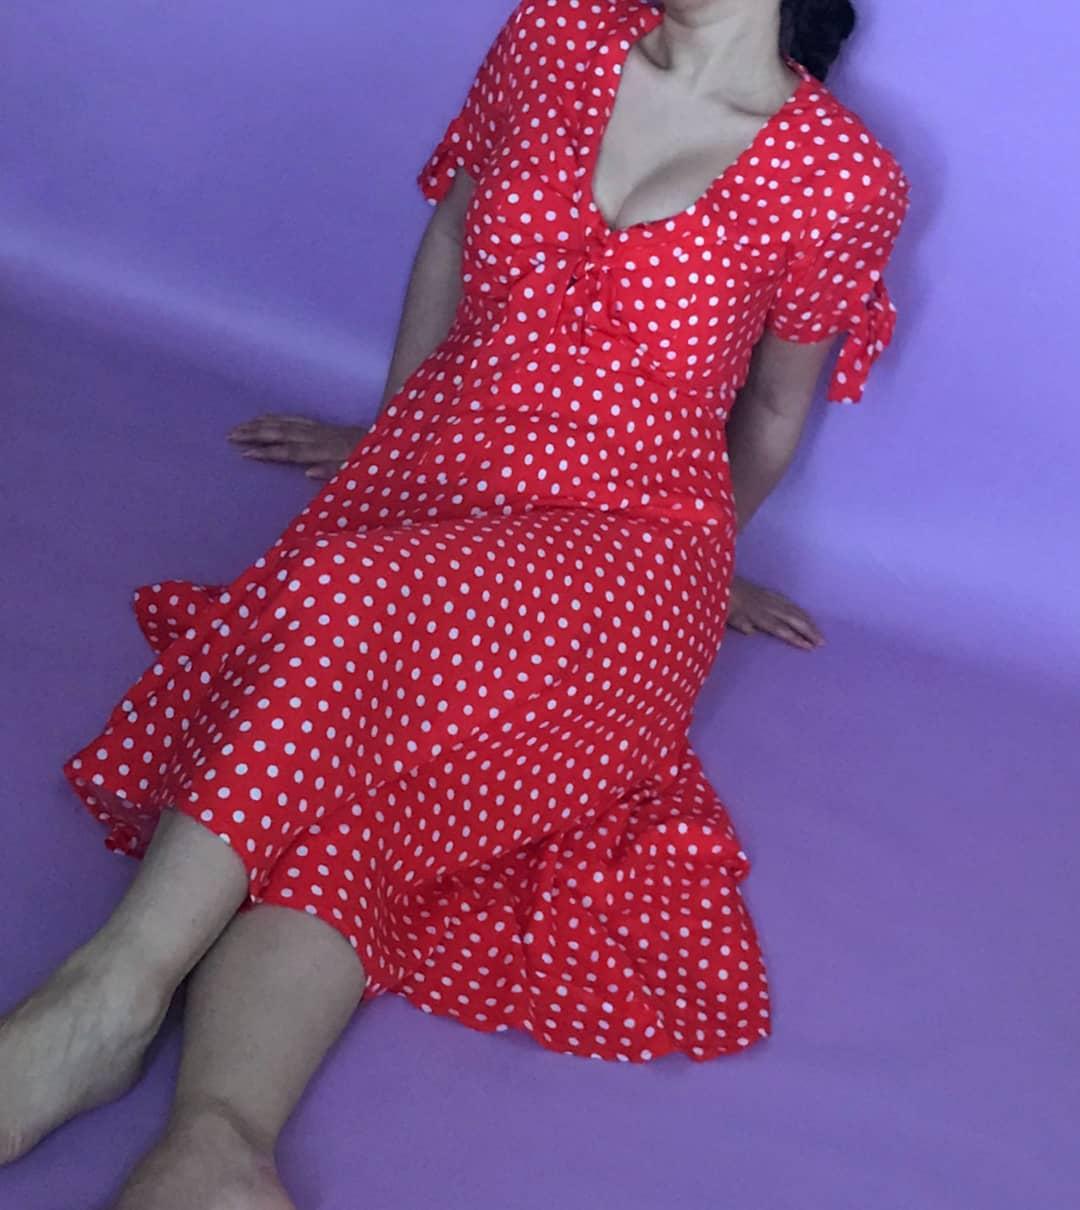 Vintage Style Polka Dots Dress